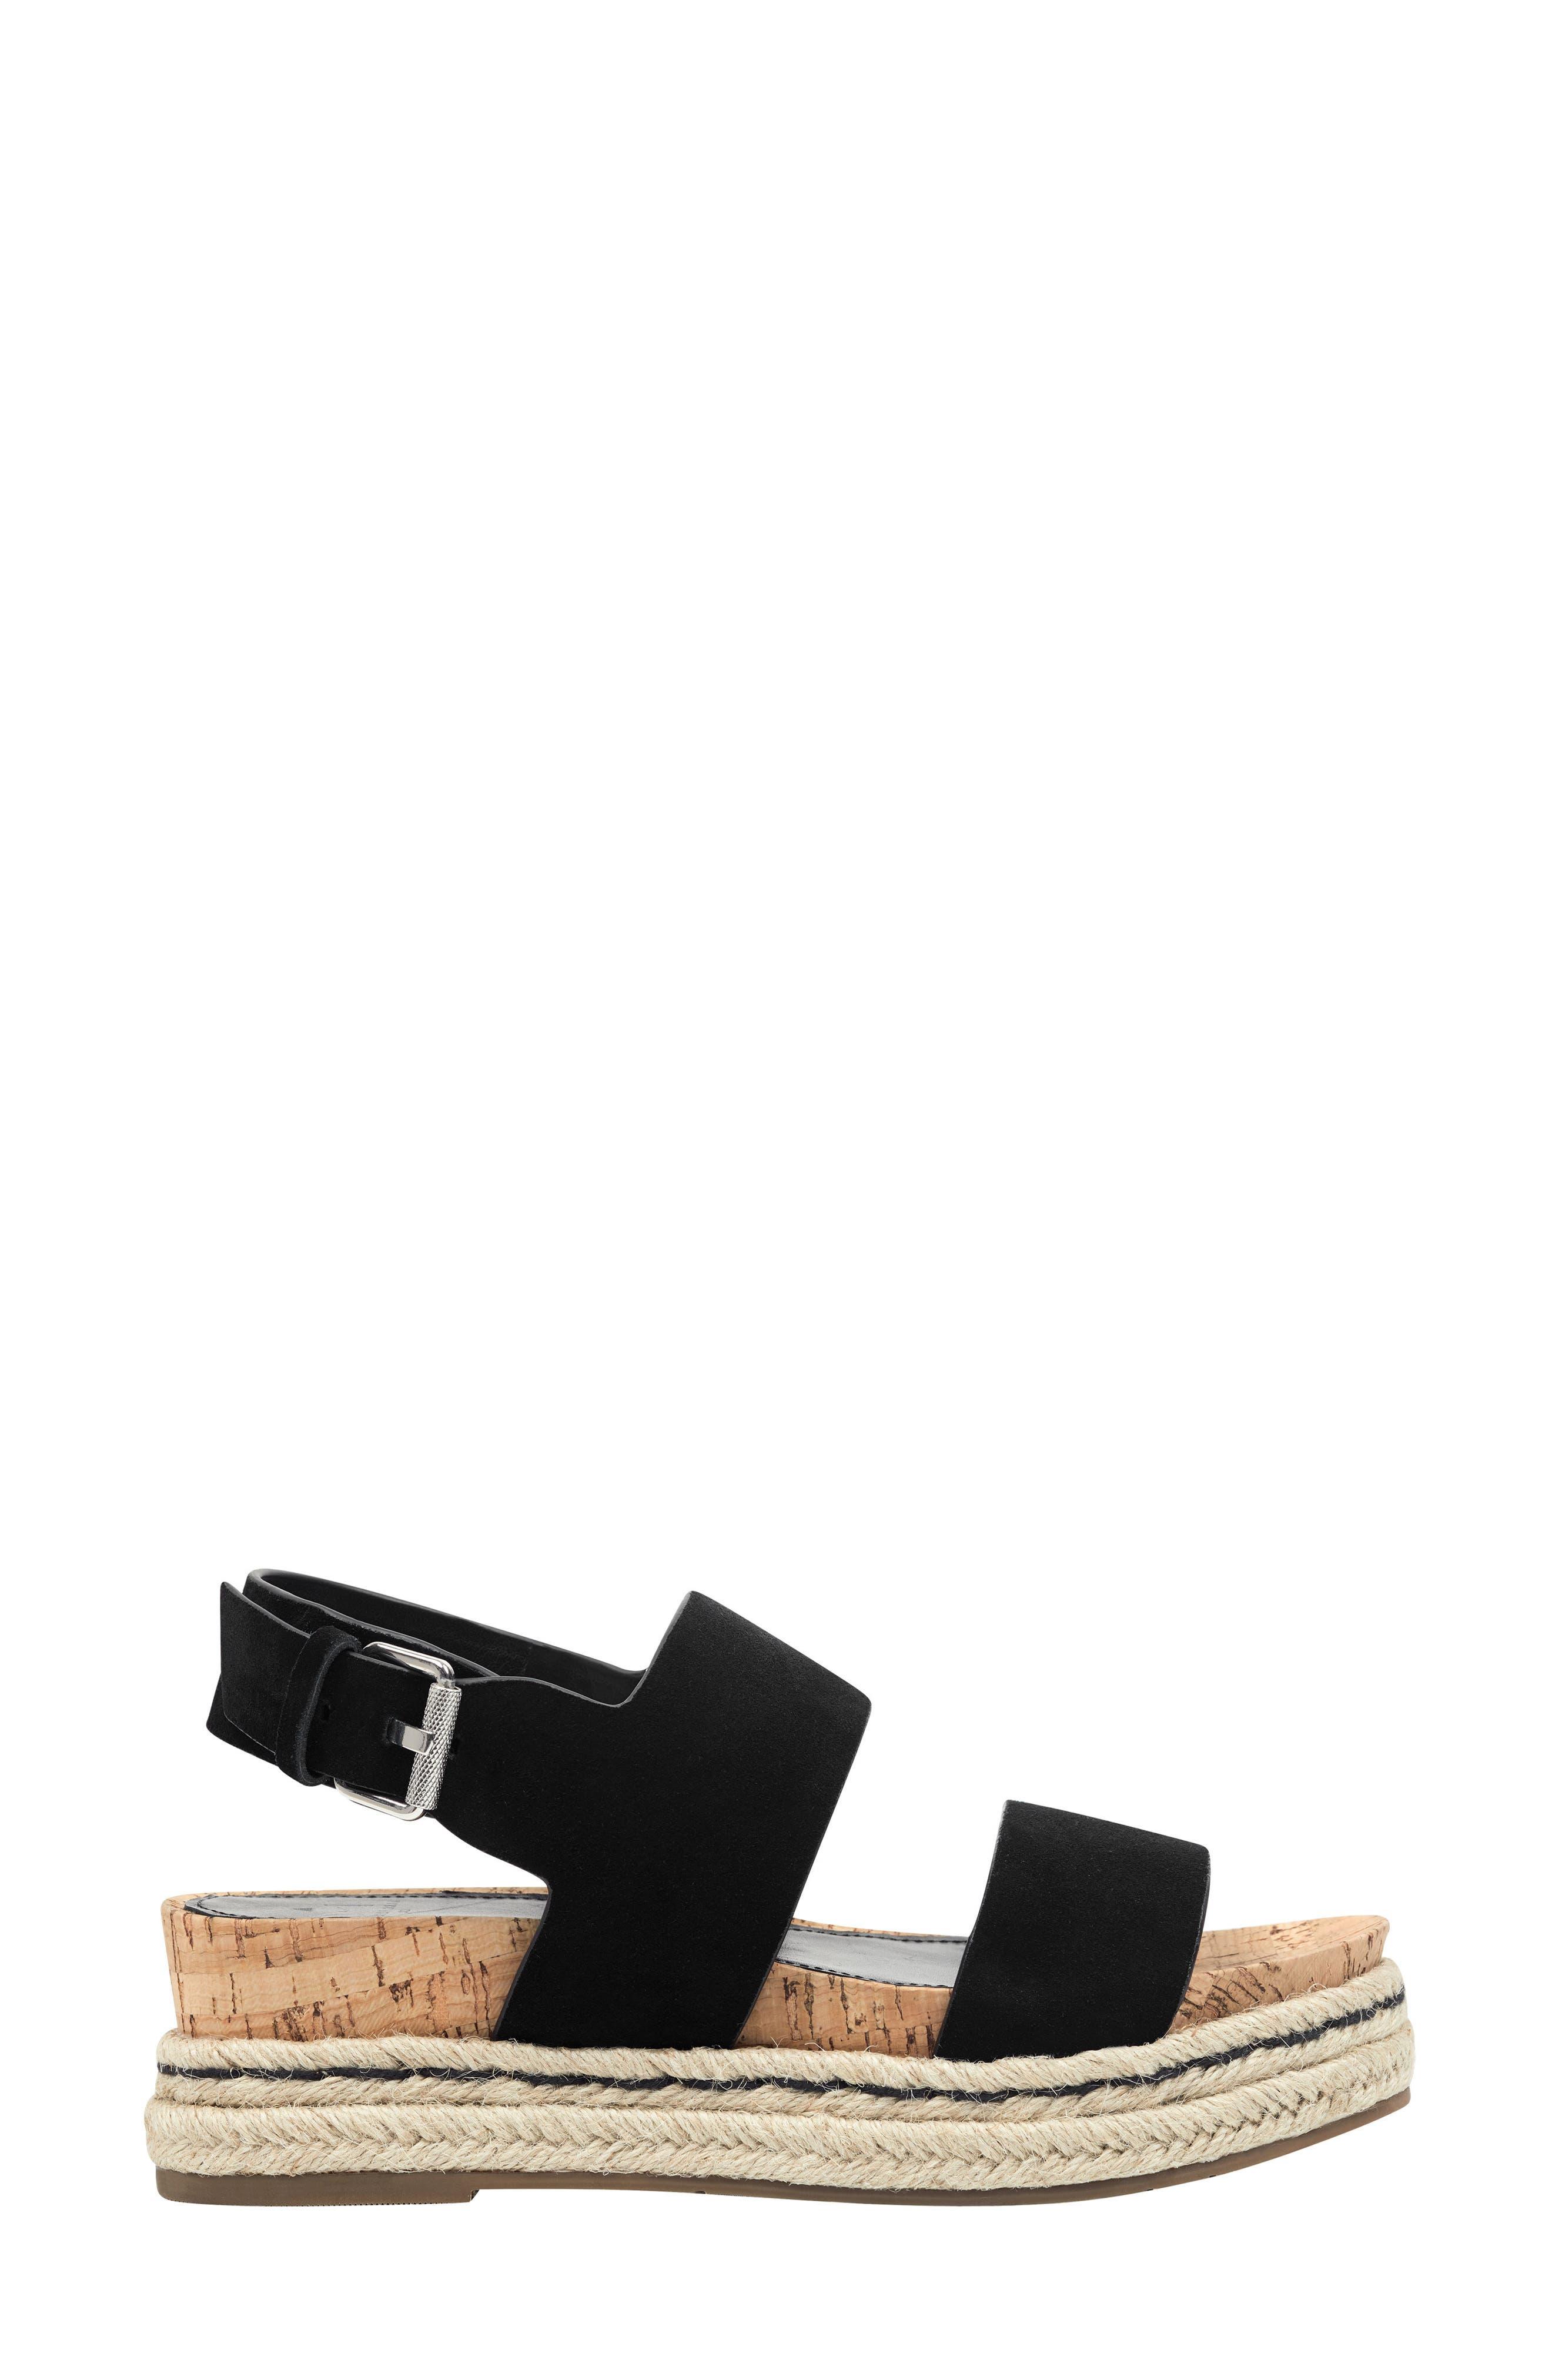 MARC FISHER LTD, Oria Espadrille Platform Sandal, Alternate thumbnail 3, color, BLACK SUEDE